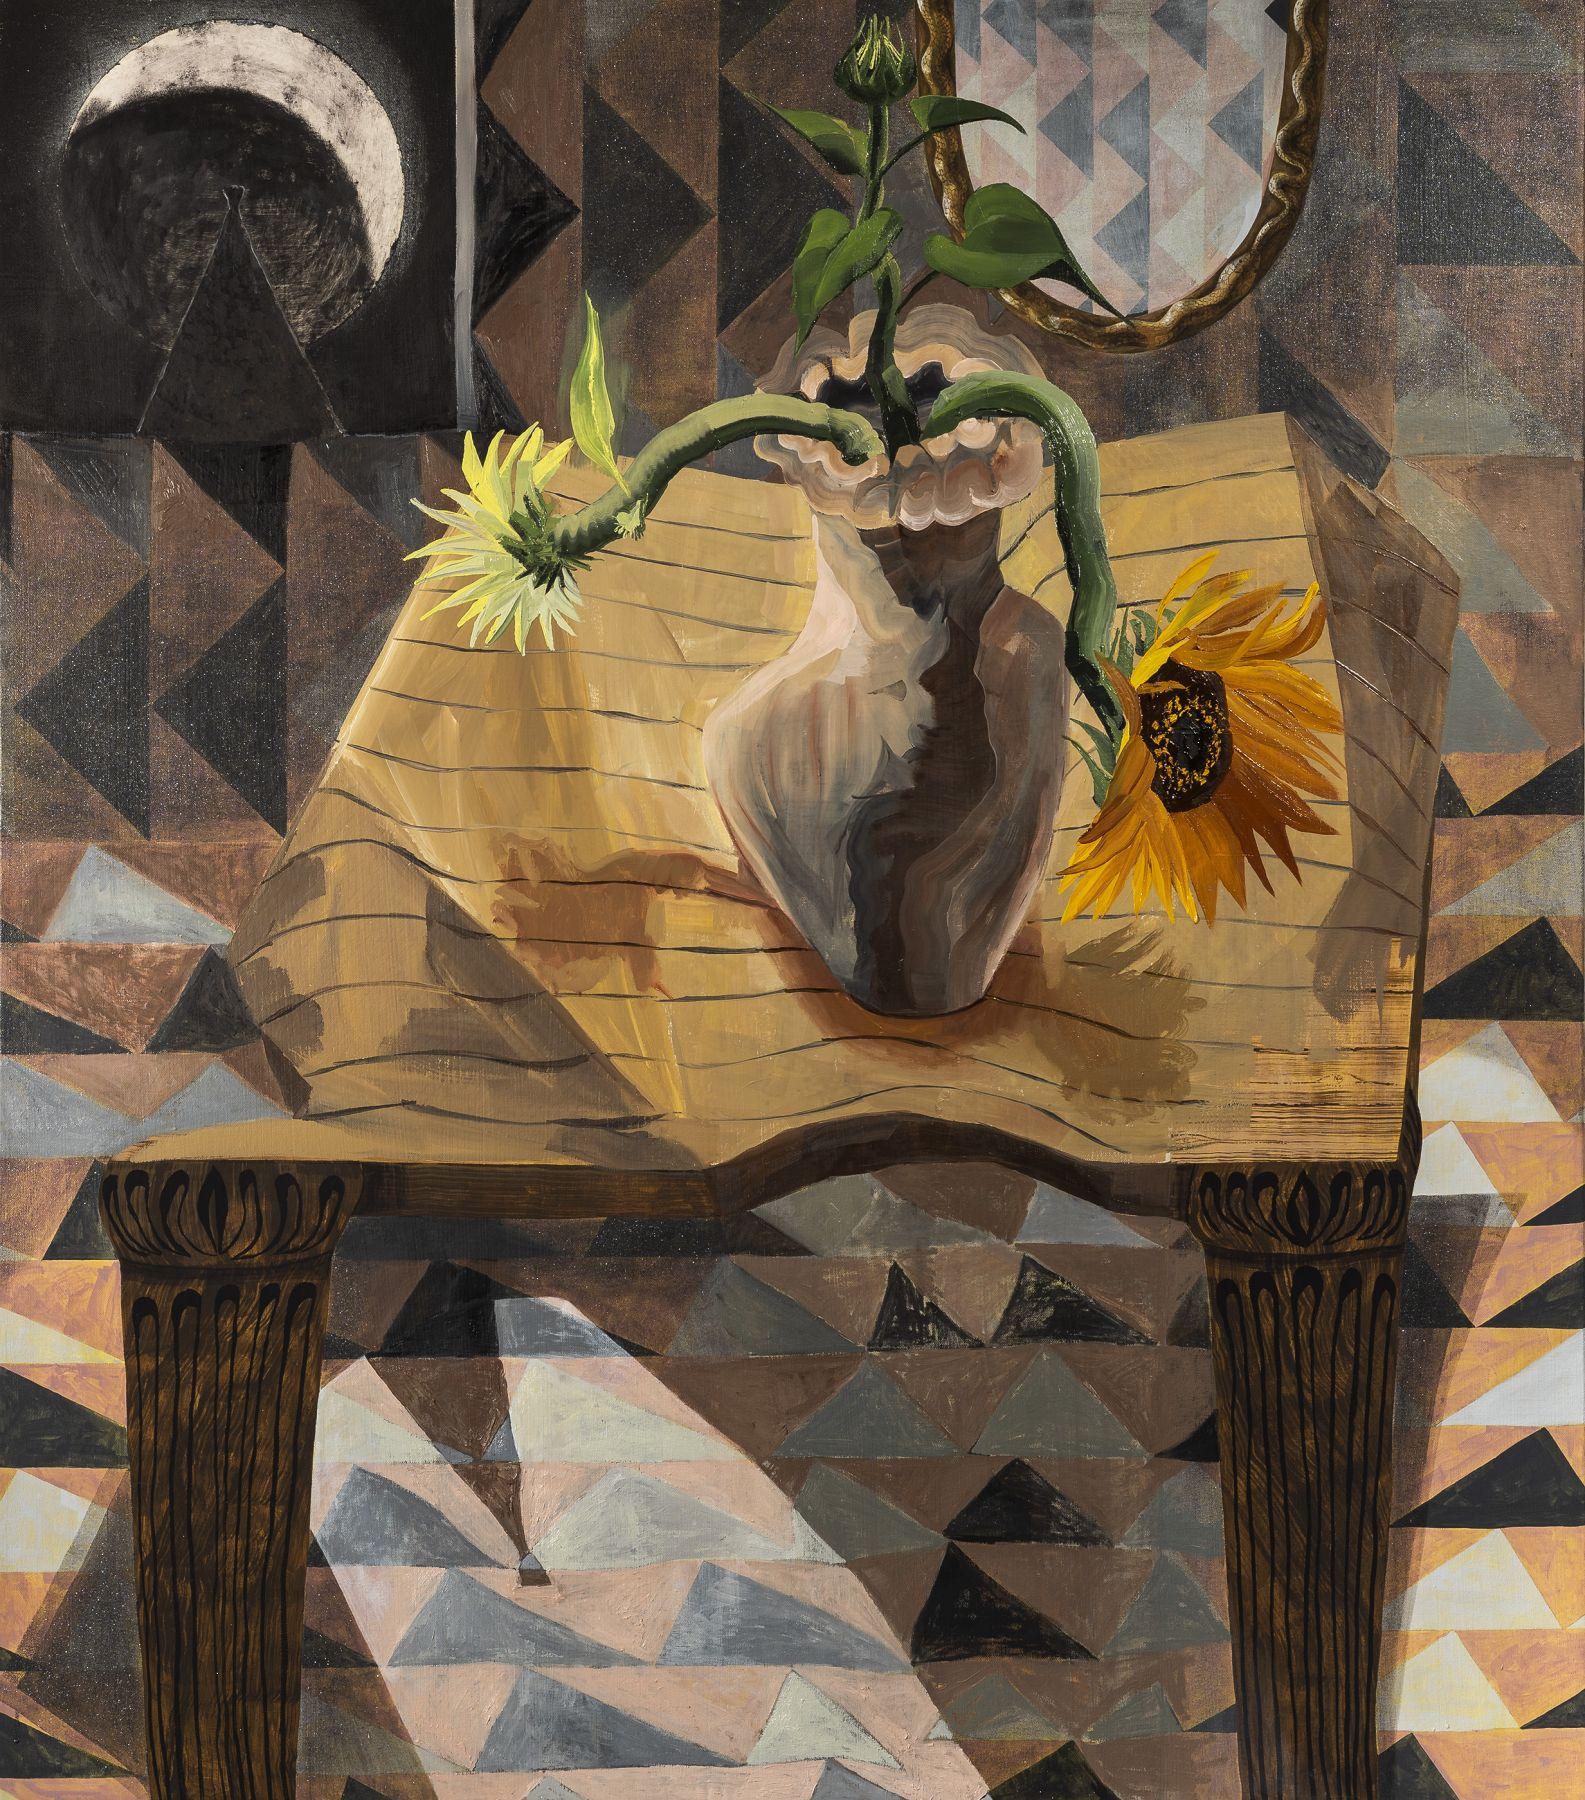 Malaska - Still Life with Moon and Flowers